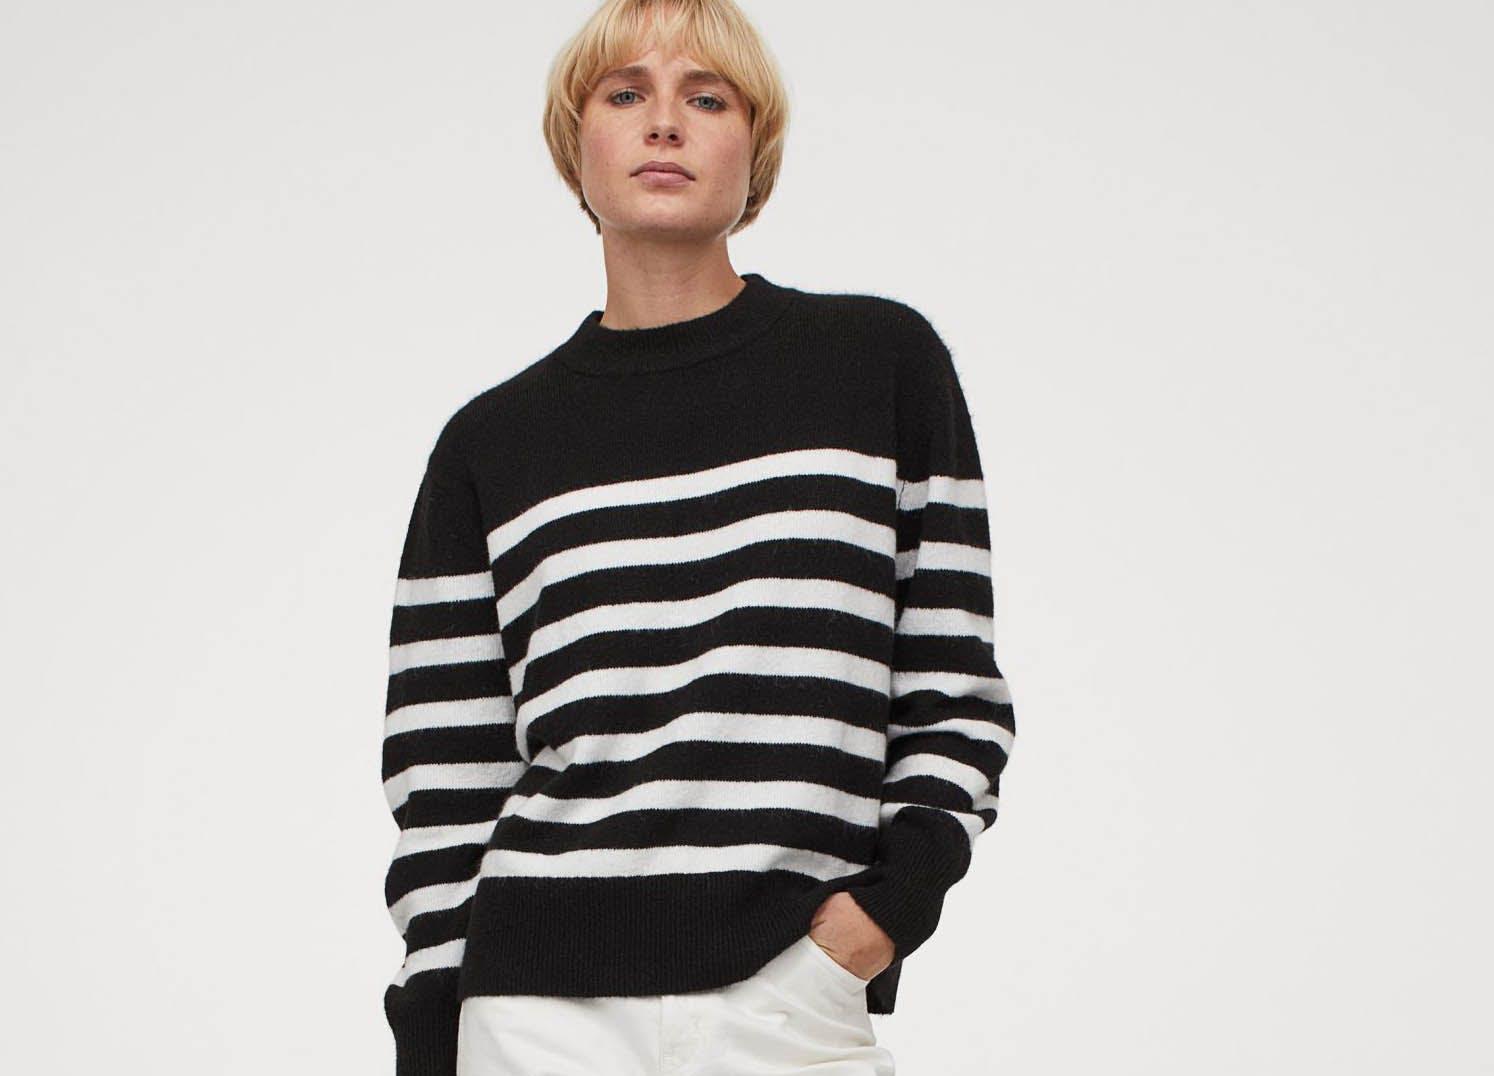 hm winter sweaters under 30 stripe